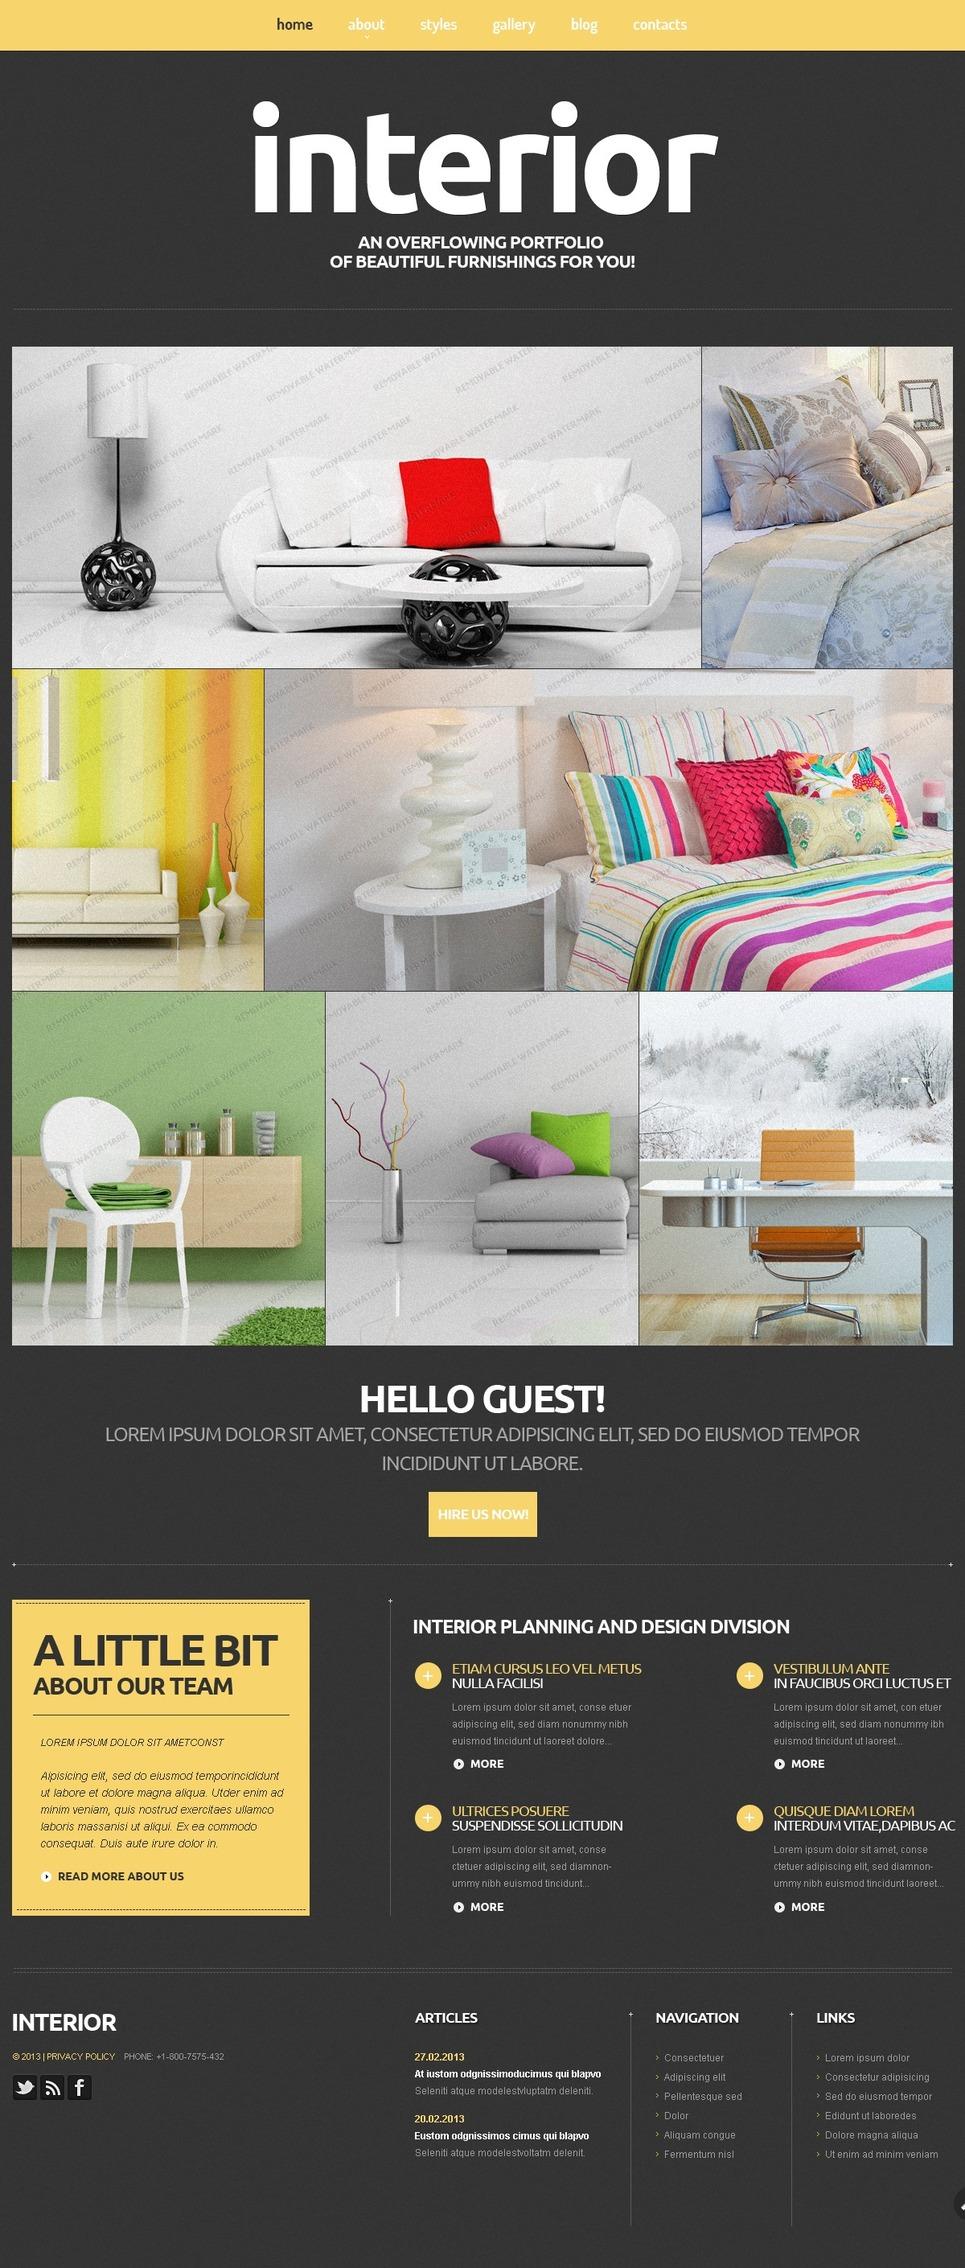 Free Interior Joomla 3 Template Joomla Template New Screenshots BIG